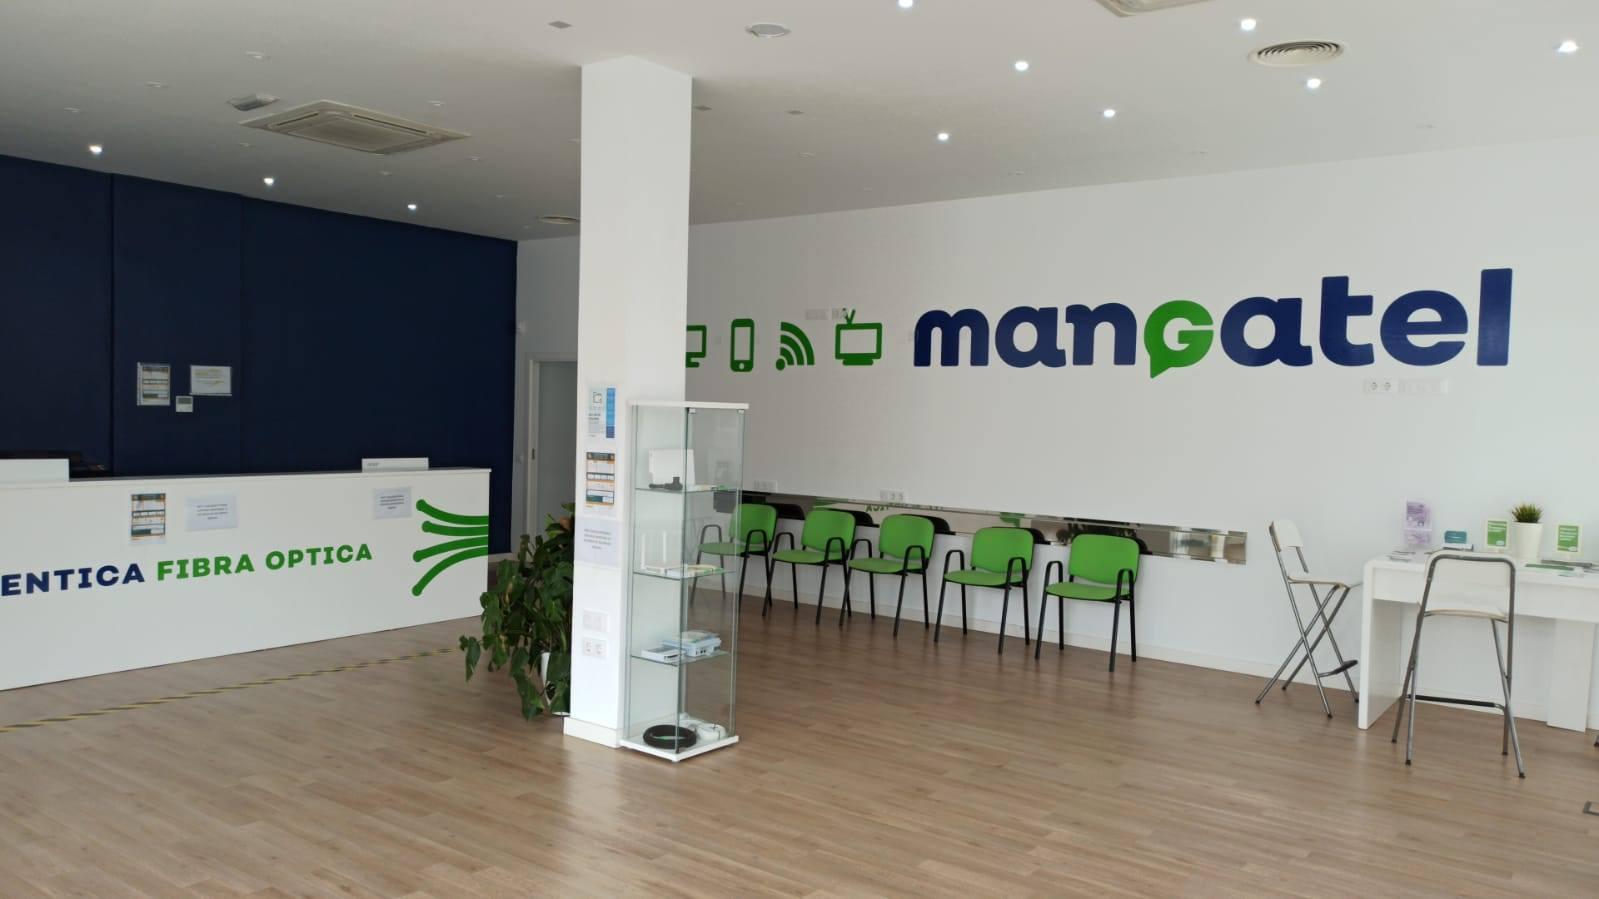 Mangatel